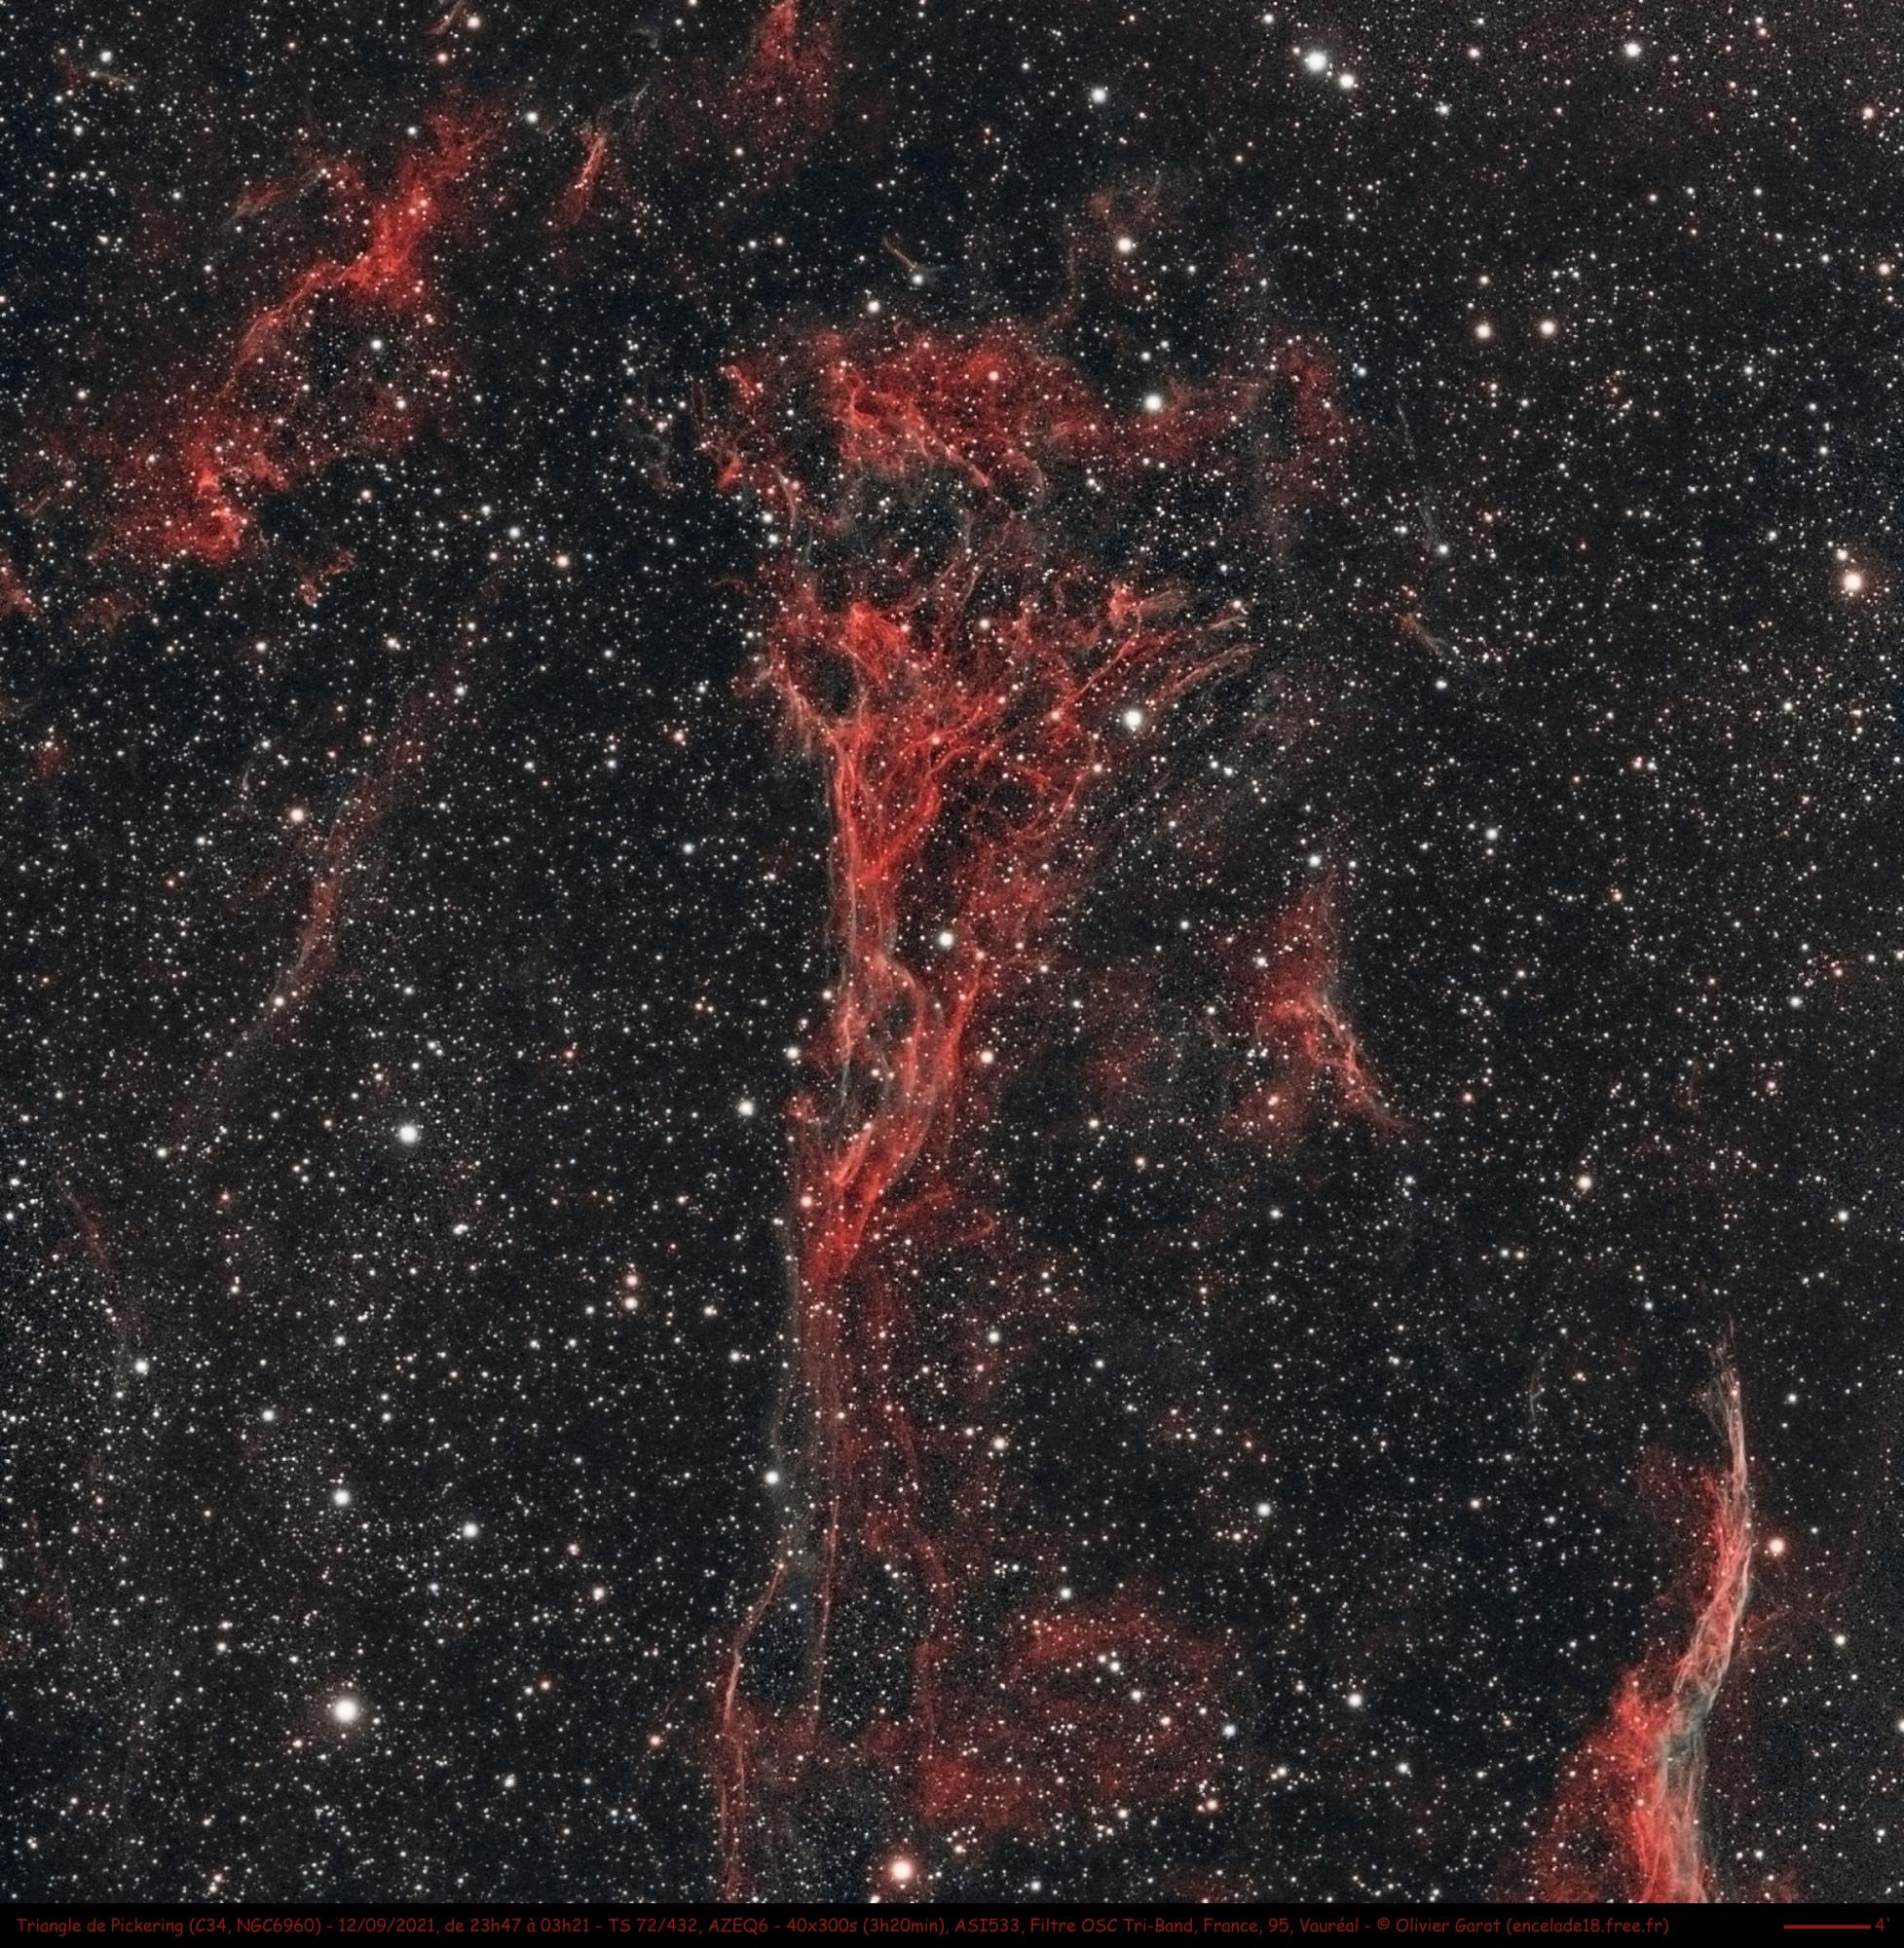 NGC6960PT_2021_09_12_SSFW_DOF_40im300s_csr_eG_ecp_th1_MFtftc1BC40_RB_rbm_MFfph_MFb1_GA85_HLVGs_og.thumb.jpg.ecacfb2b7ce3b0b1ceb08a51f2ed1e3c.jpg